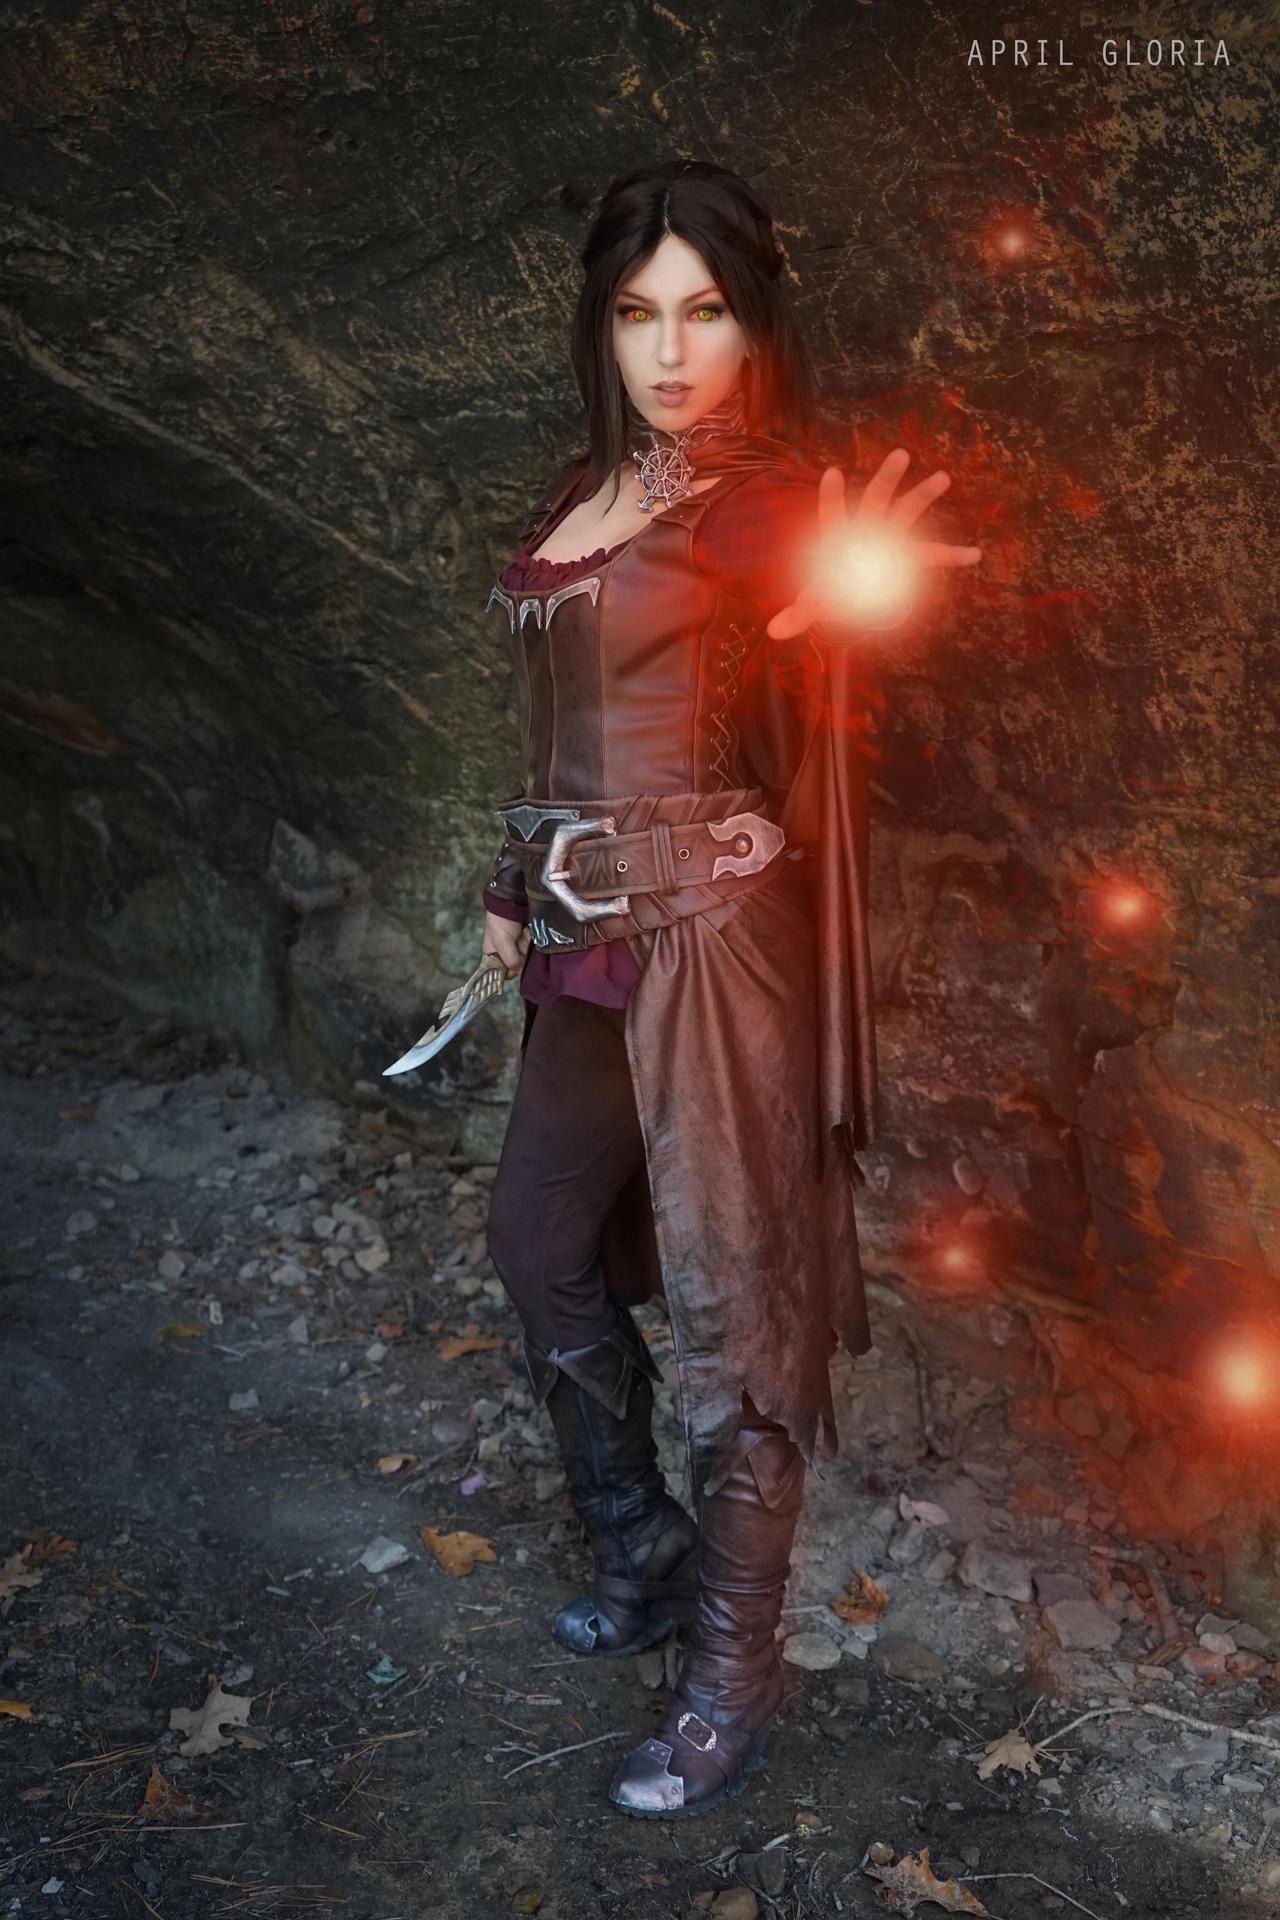 Serana Tesv Skyrim By Aprilgloriacosplay On Deviantart